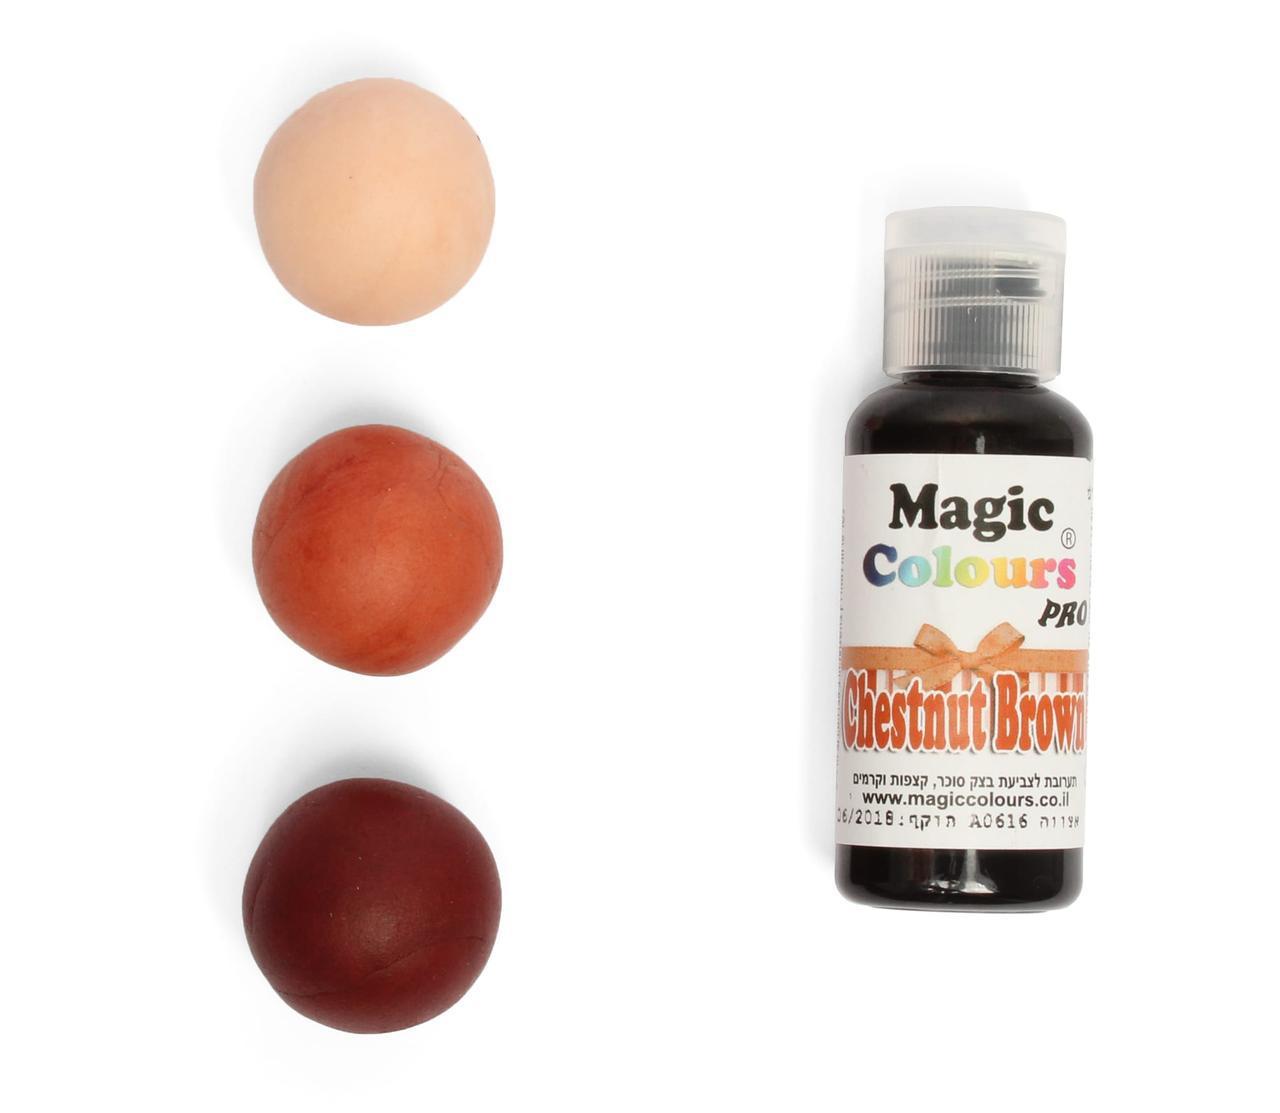 Гелевый краситель Magic Colours  Коричневый каштан (Chestnut brown) 32 грамма